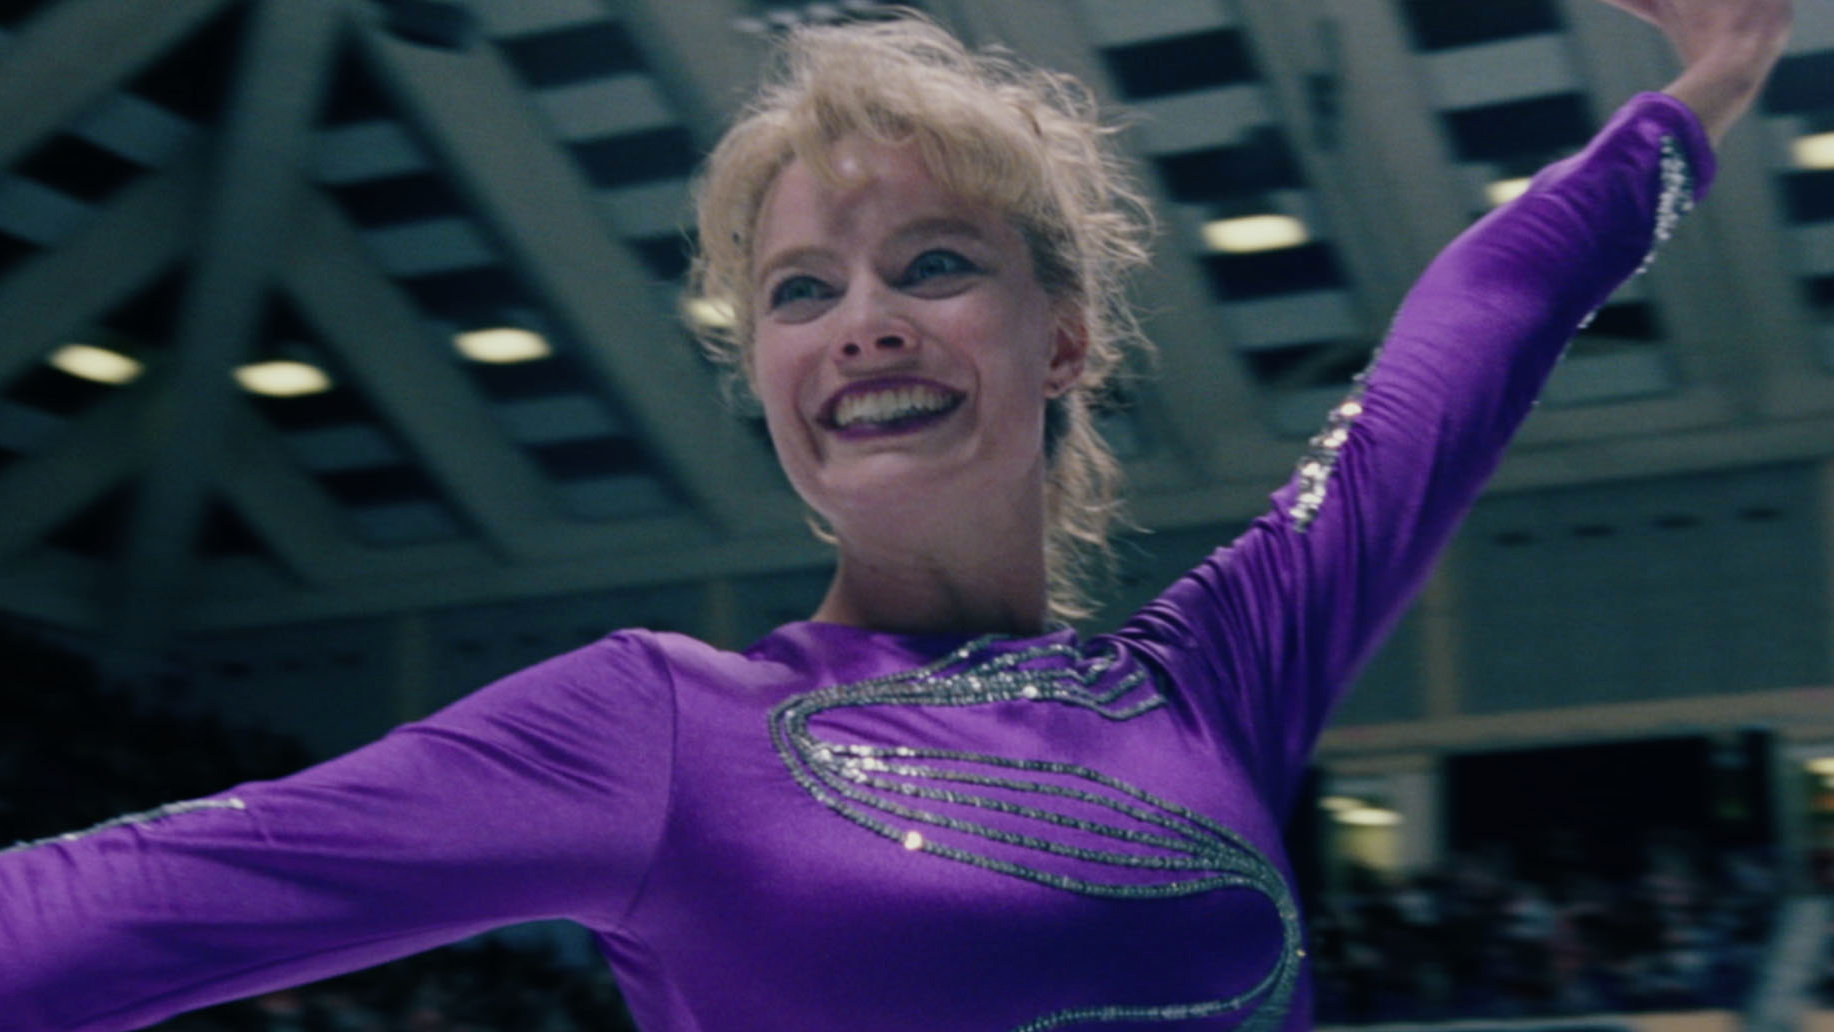 I, Tonya is brilliant - Margot Robbie as Tonya Harding